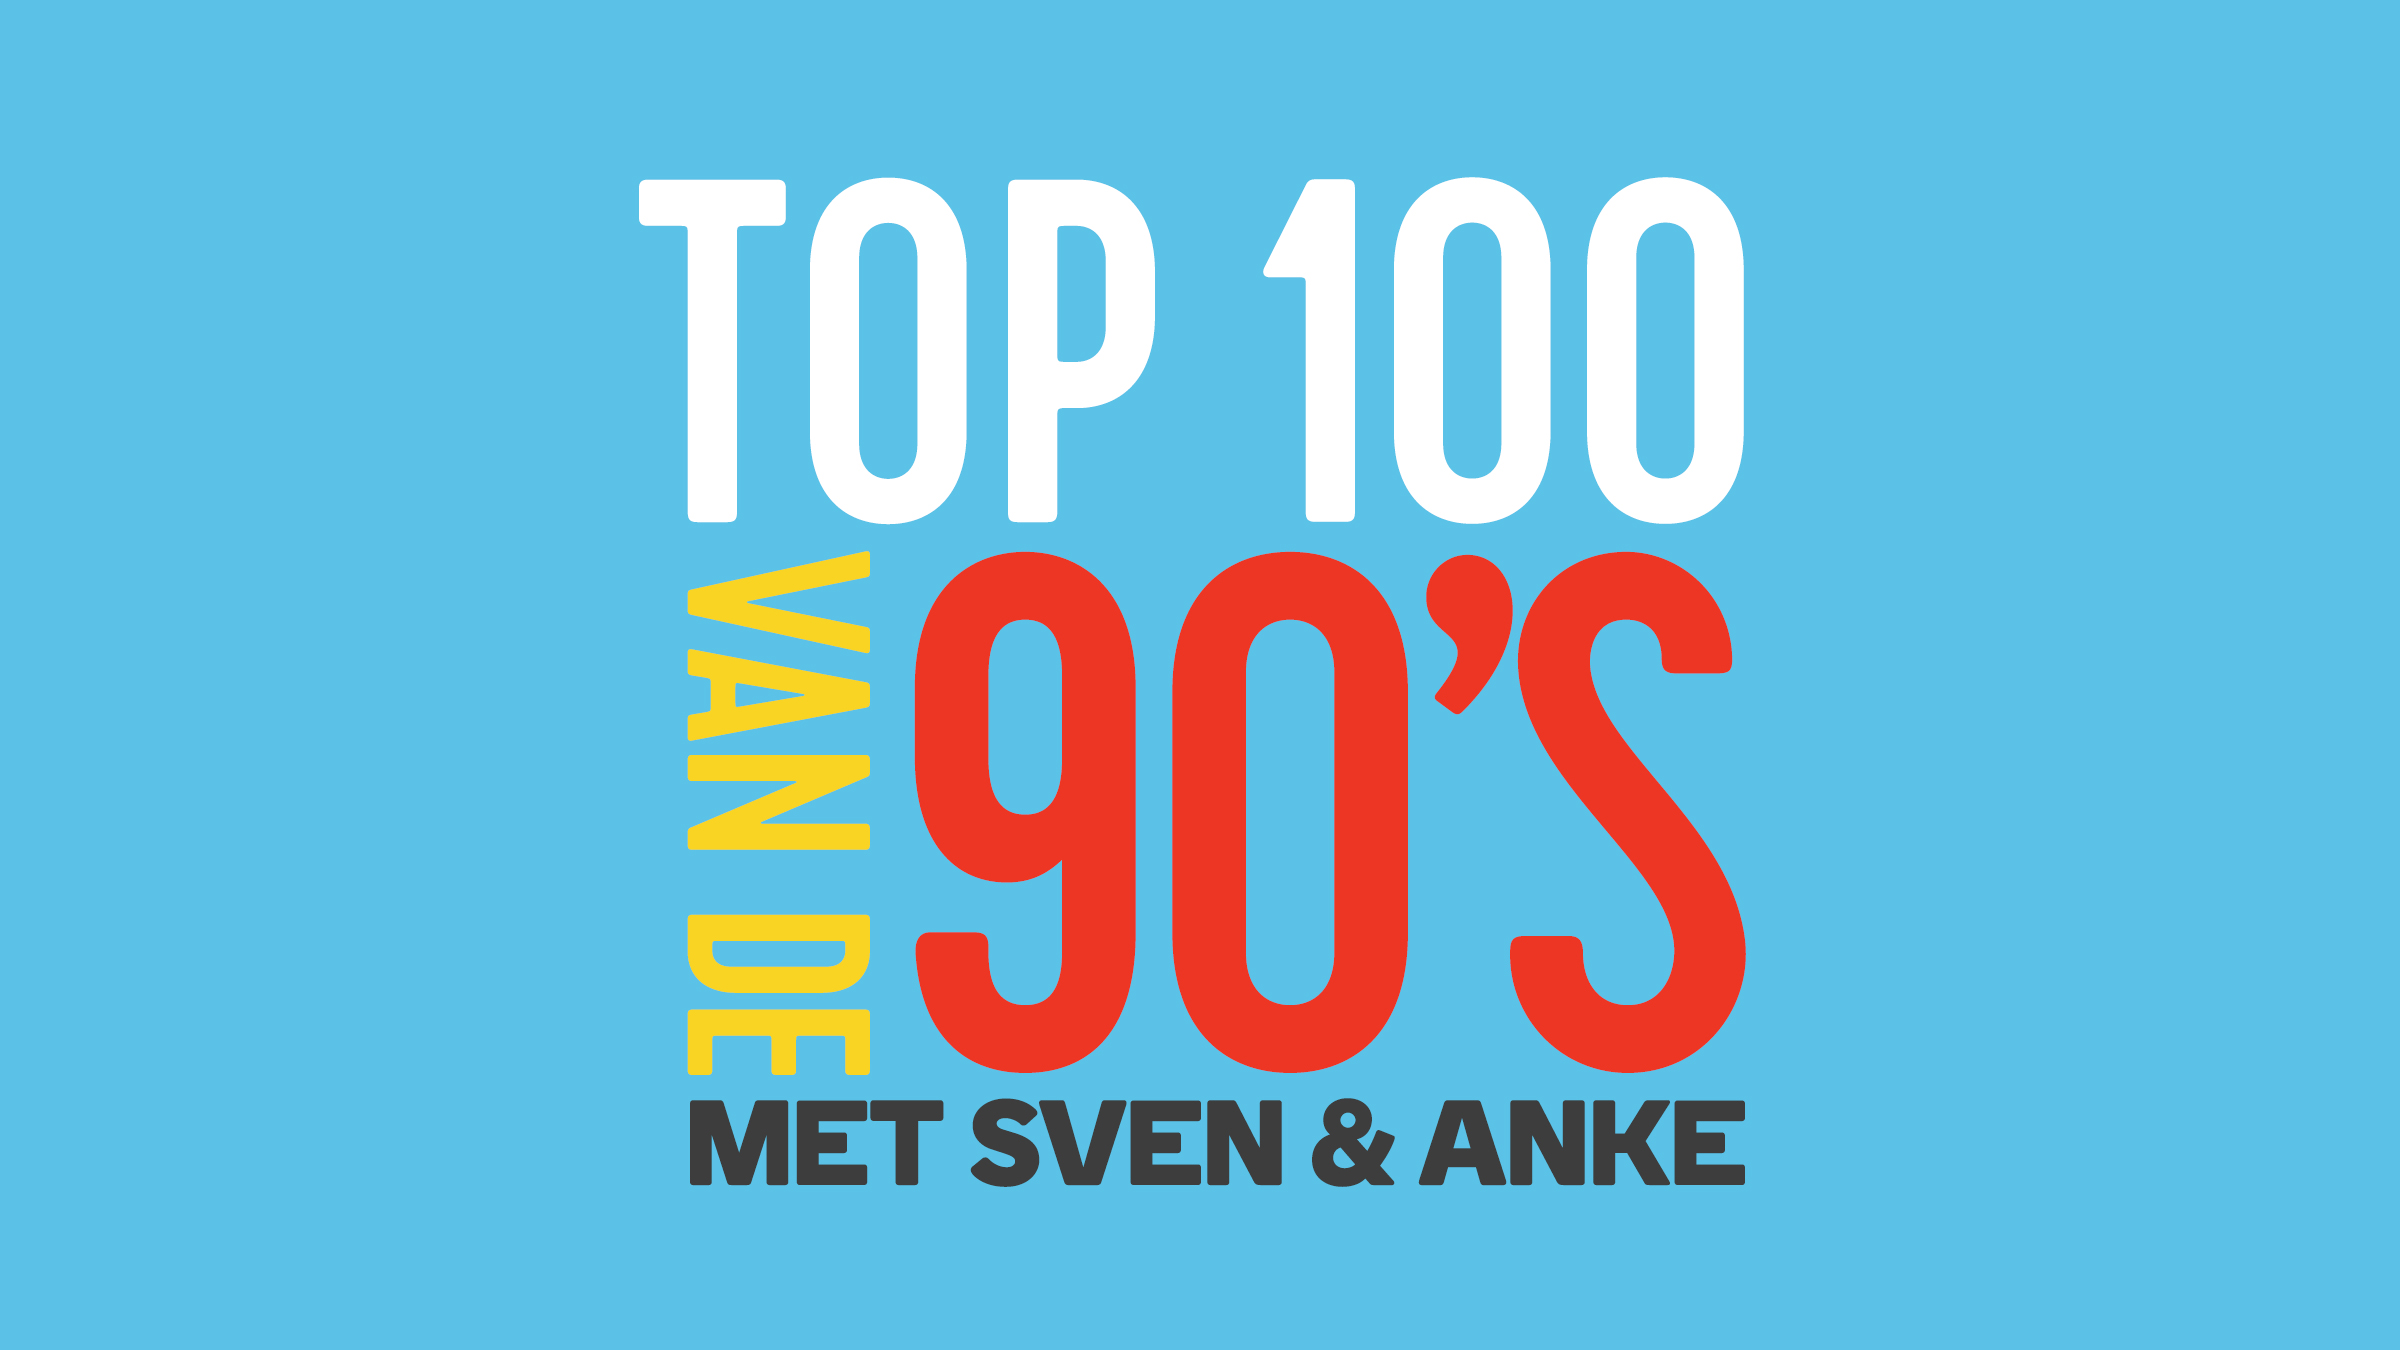 16x9 top100 vtop500vd90s